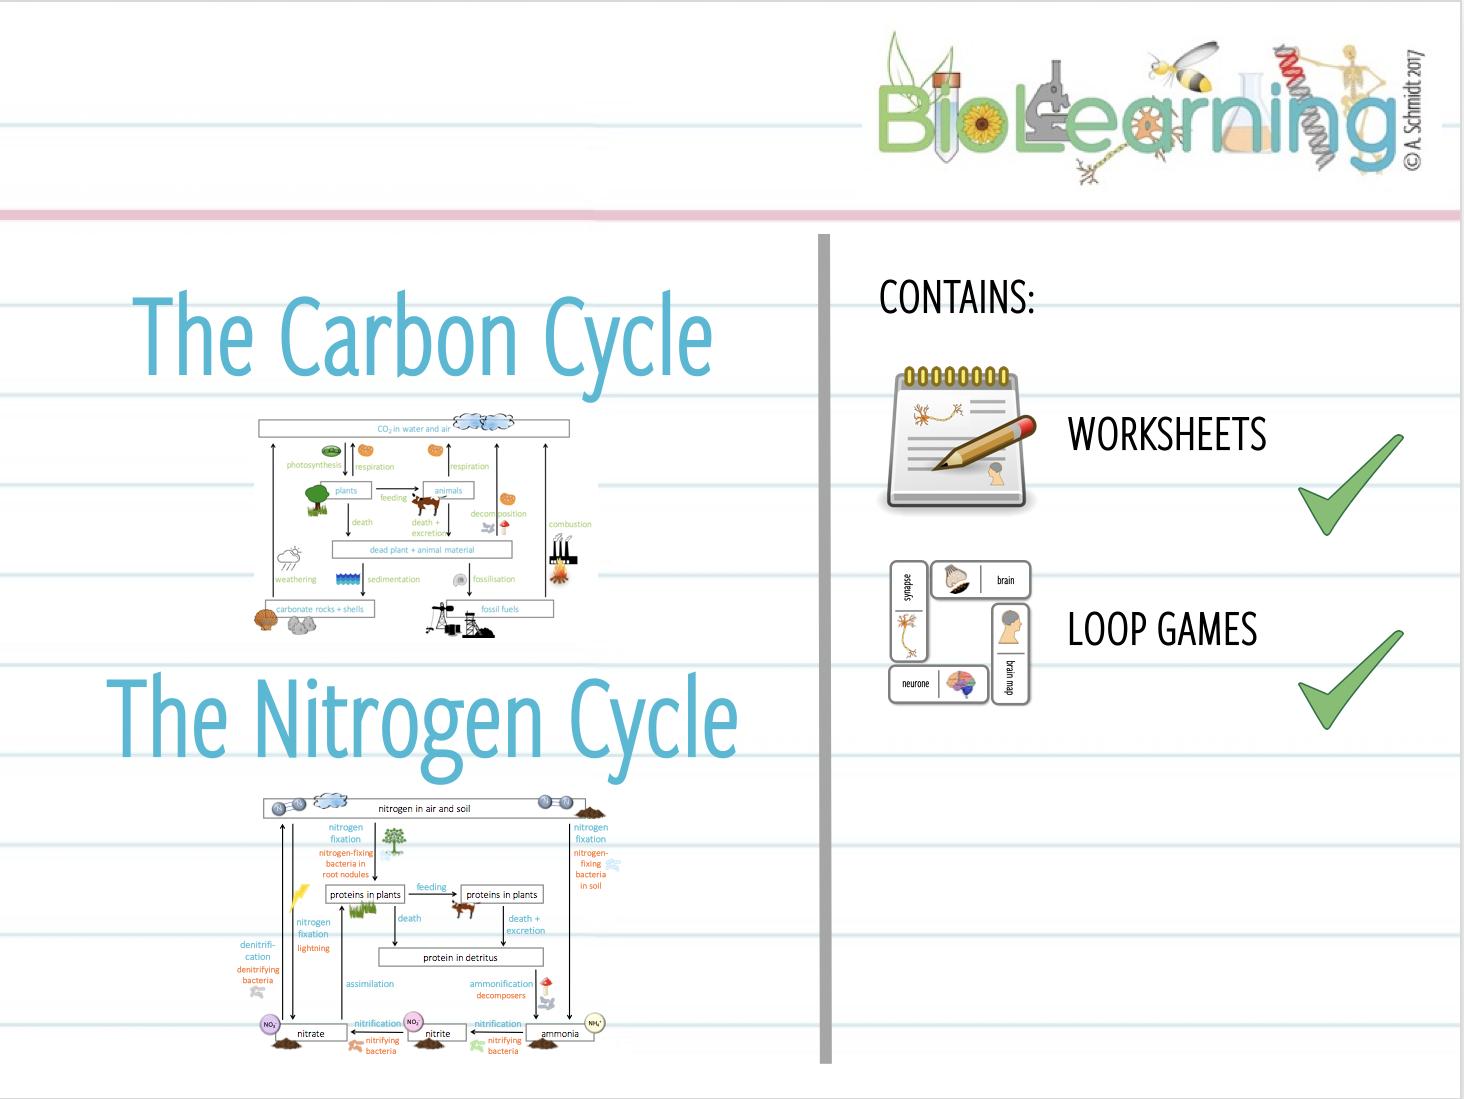 worksheet The Nitrogen Cycle Worksheet 4x carbon and nitrogen cycle 2x worksheets loop games ks3ks4 by anjacschmidt teaching resources tes